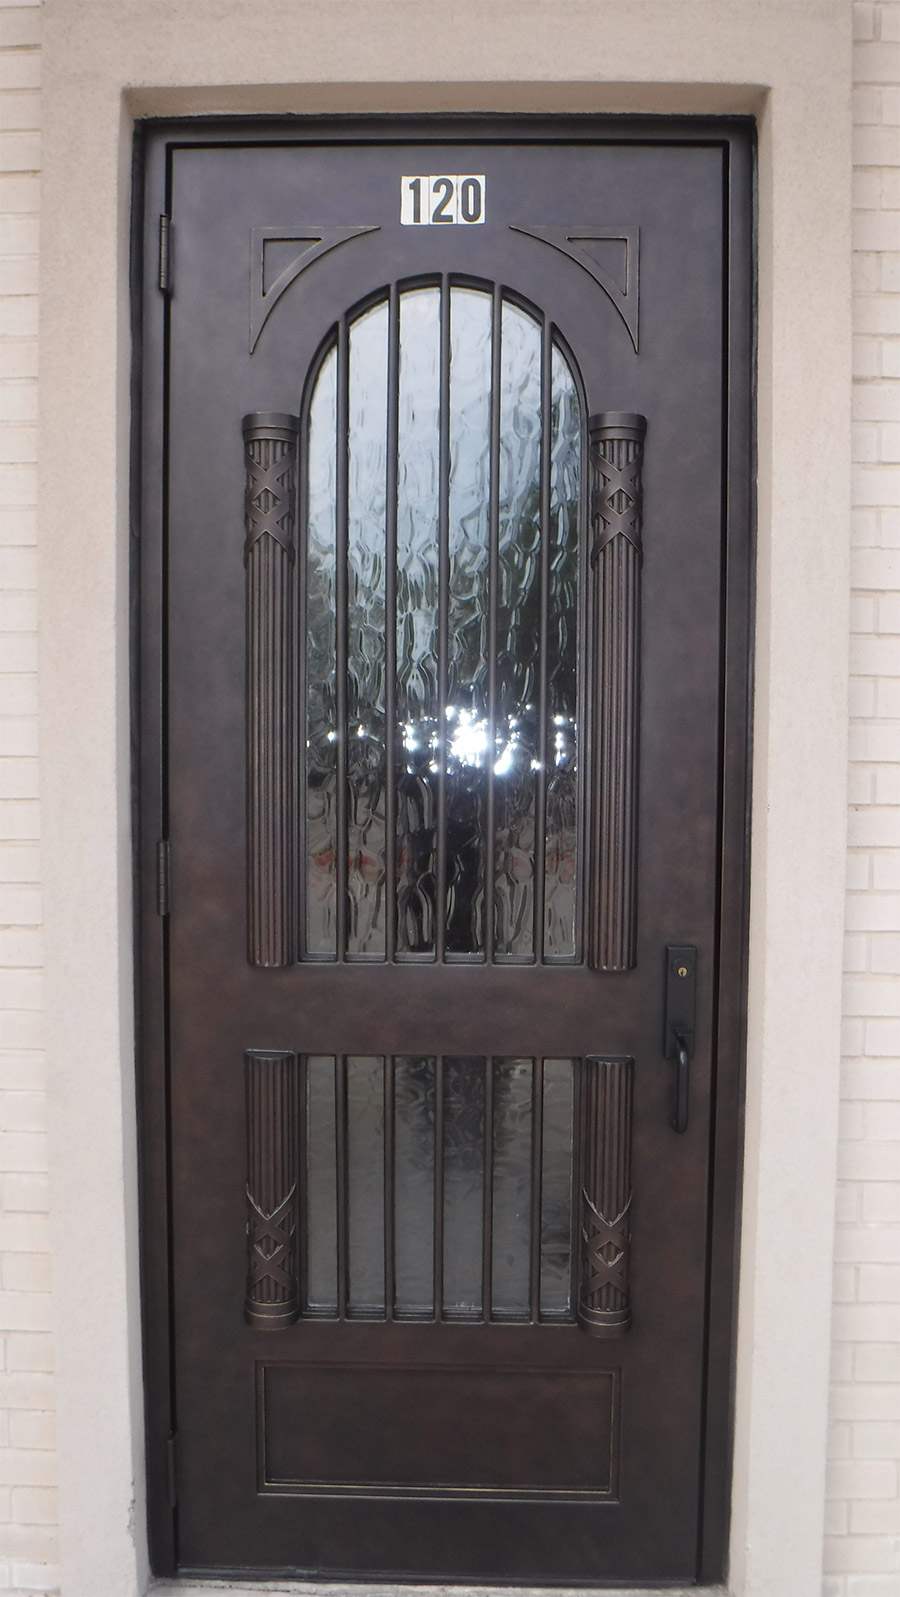 Worthington-CLA-S2-073-Classic-Steel-Doors-(15)-como-objeto-inteligente-1